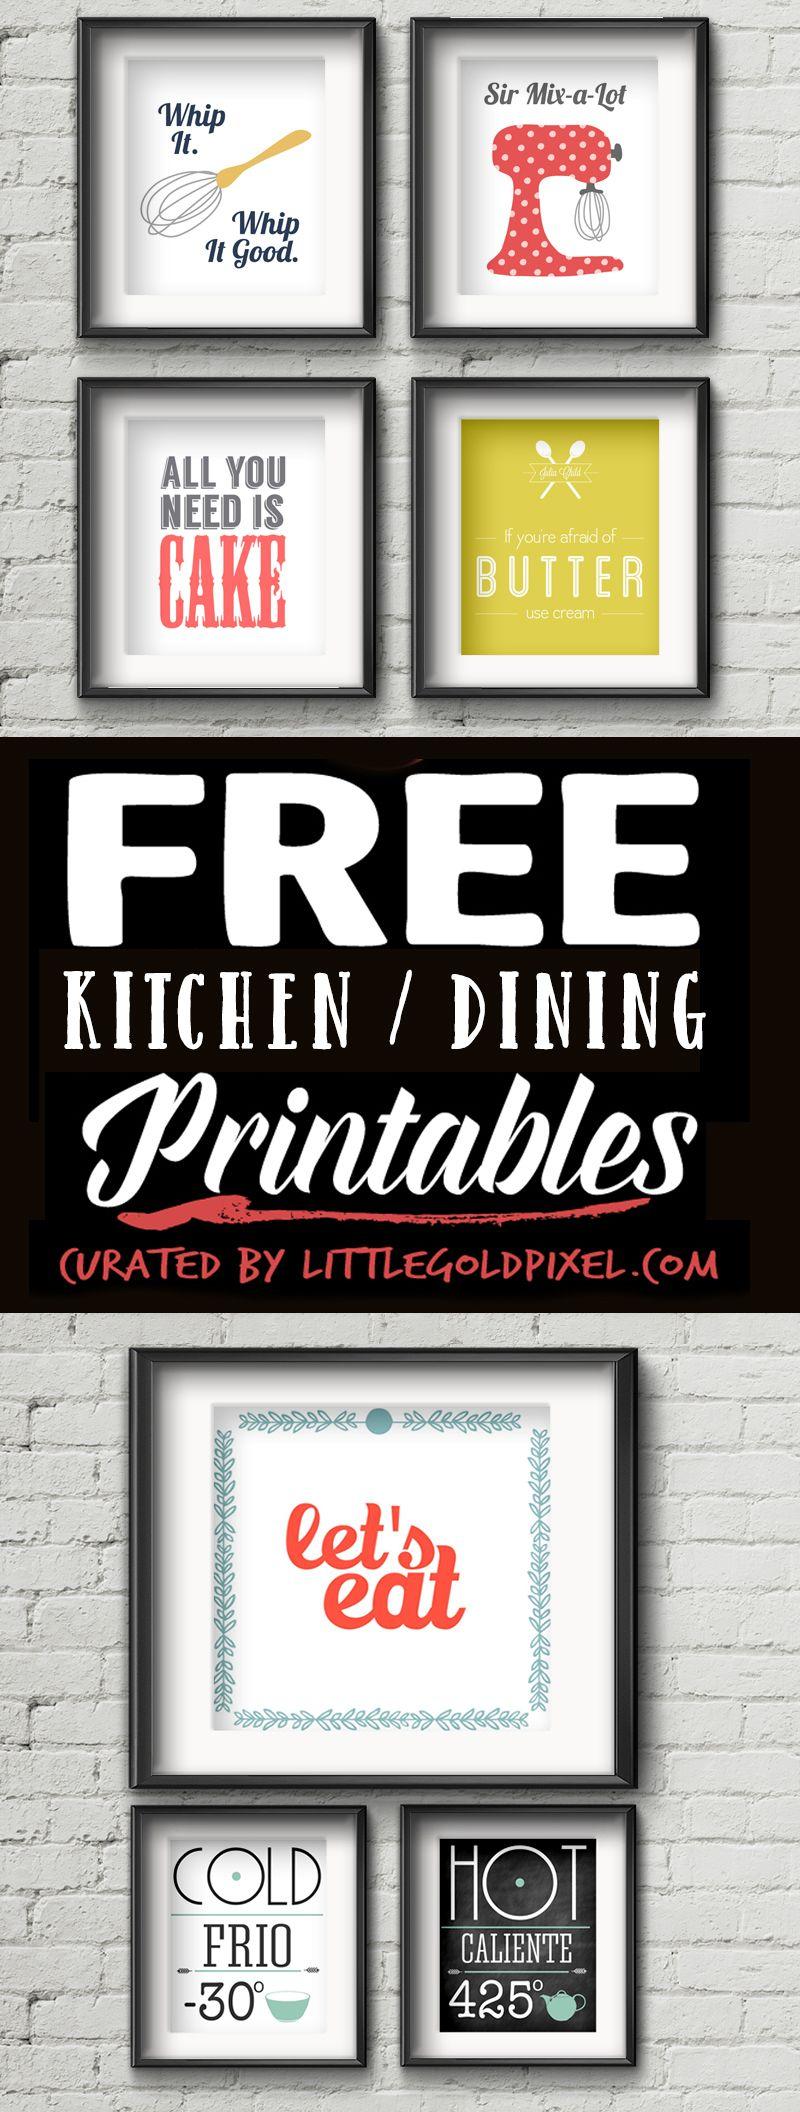 kitchen free printables u wall art roundup things to make